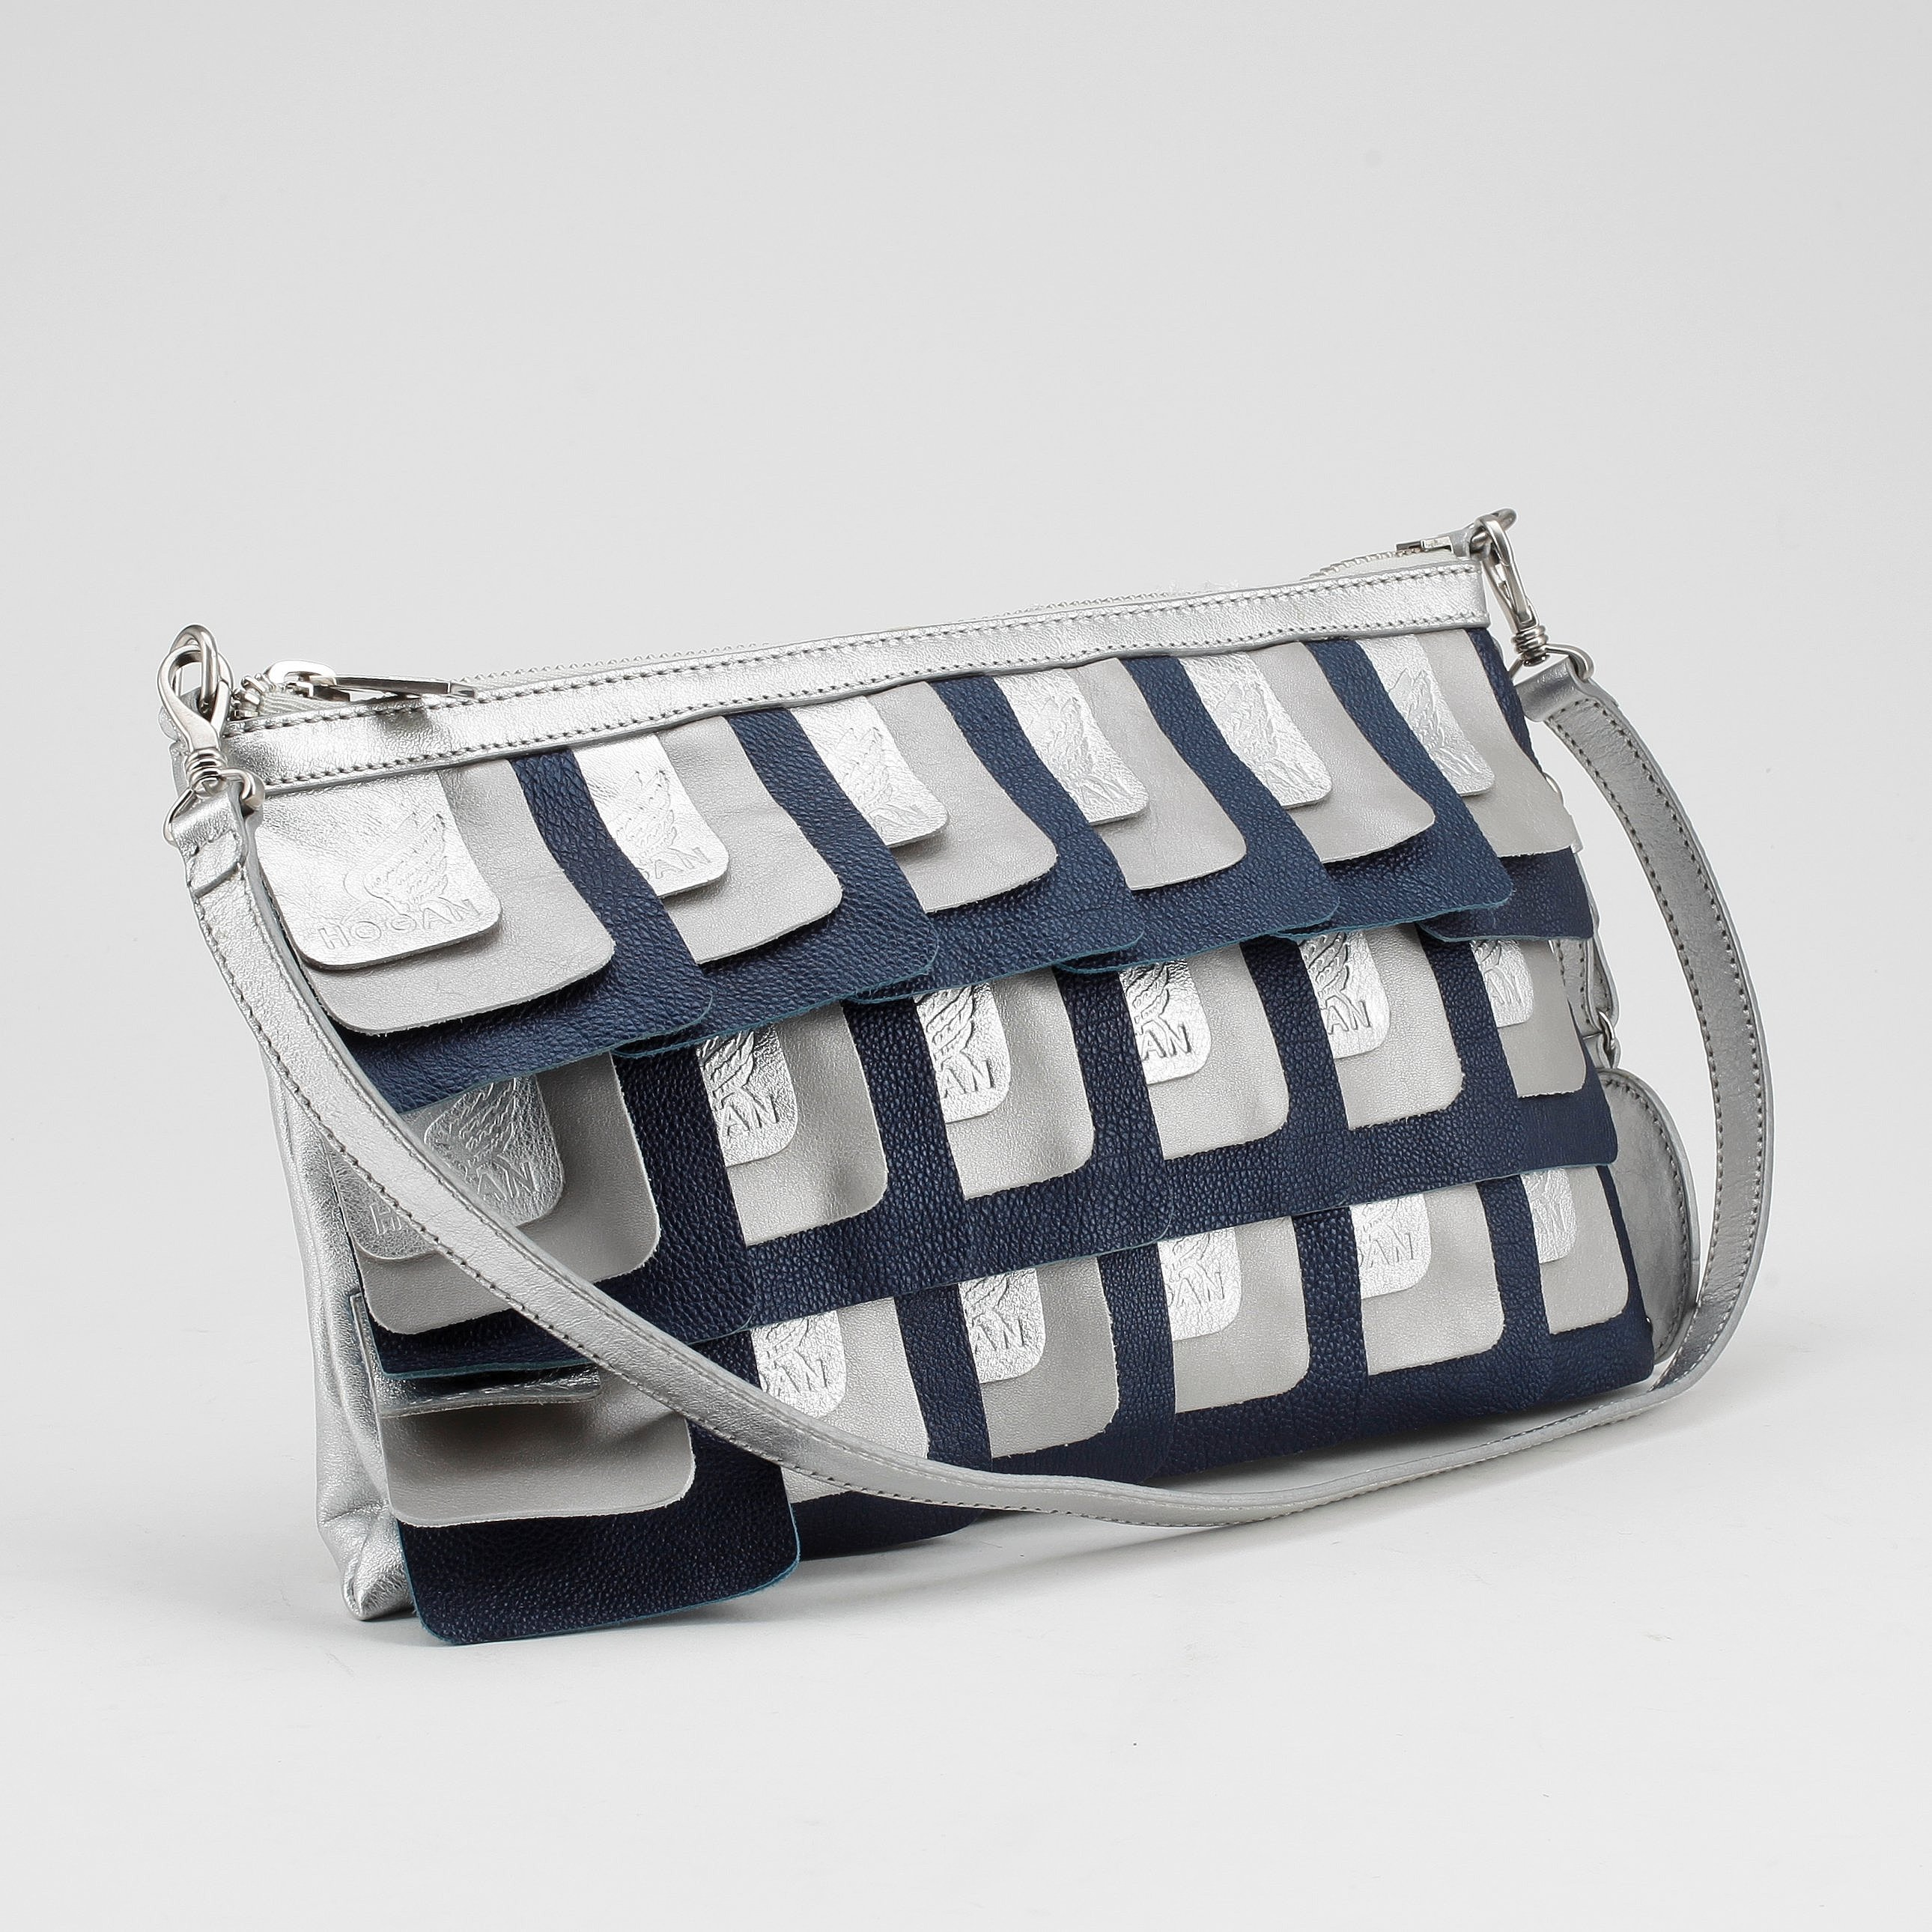 site réputé acd3b 45a8b HOGAN BY KARL LAGERFELD, a silver and blue leather clutch ...